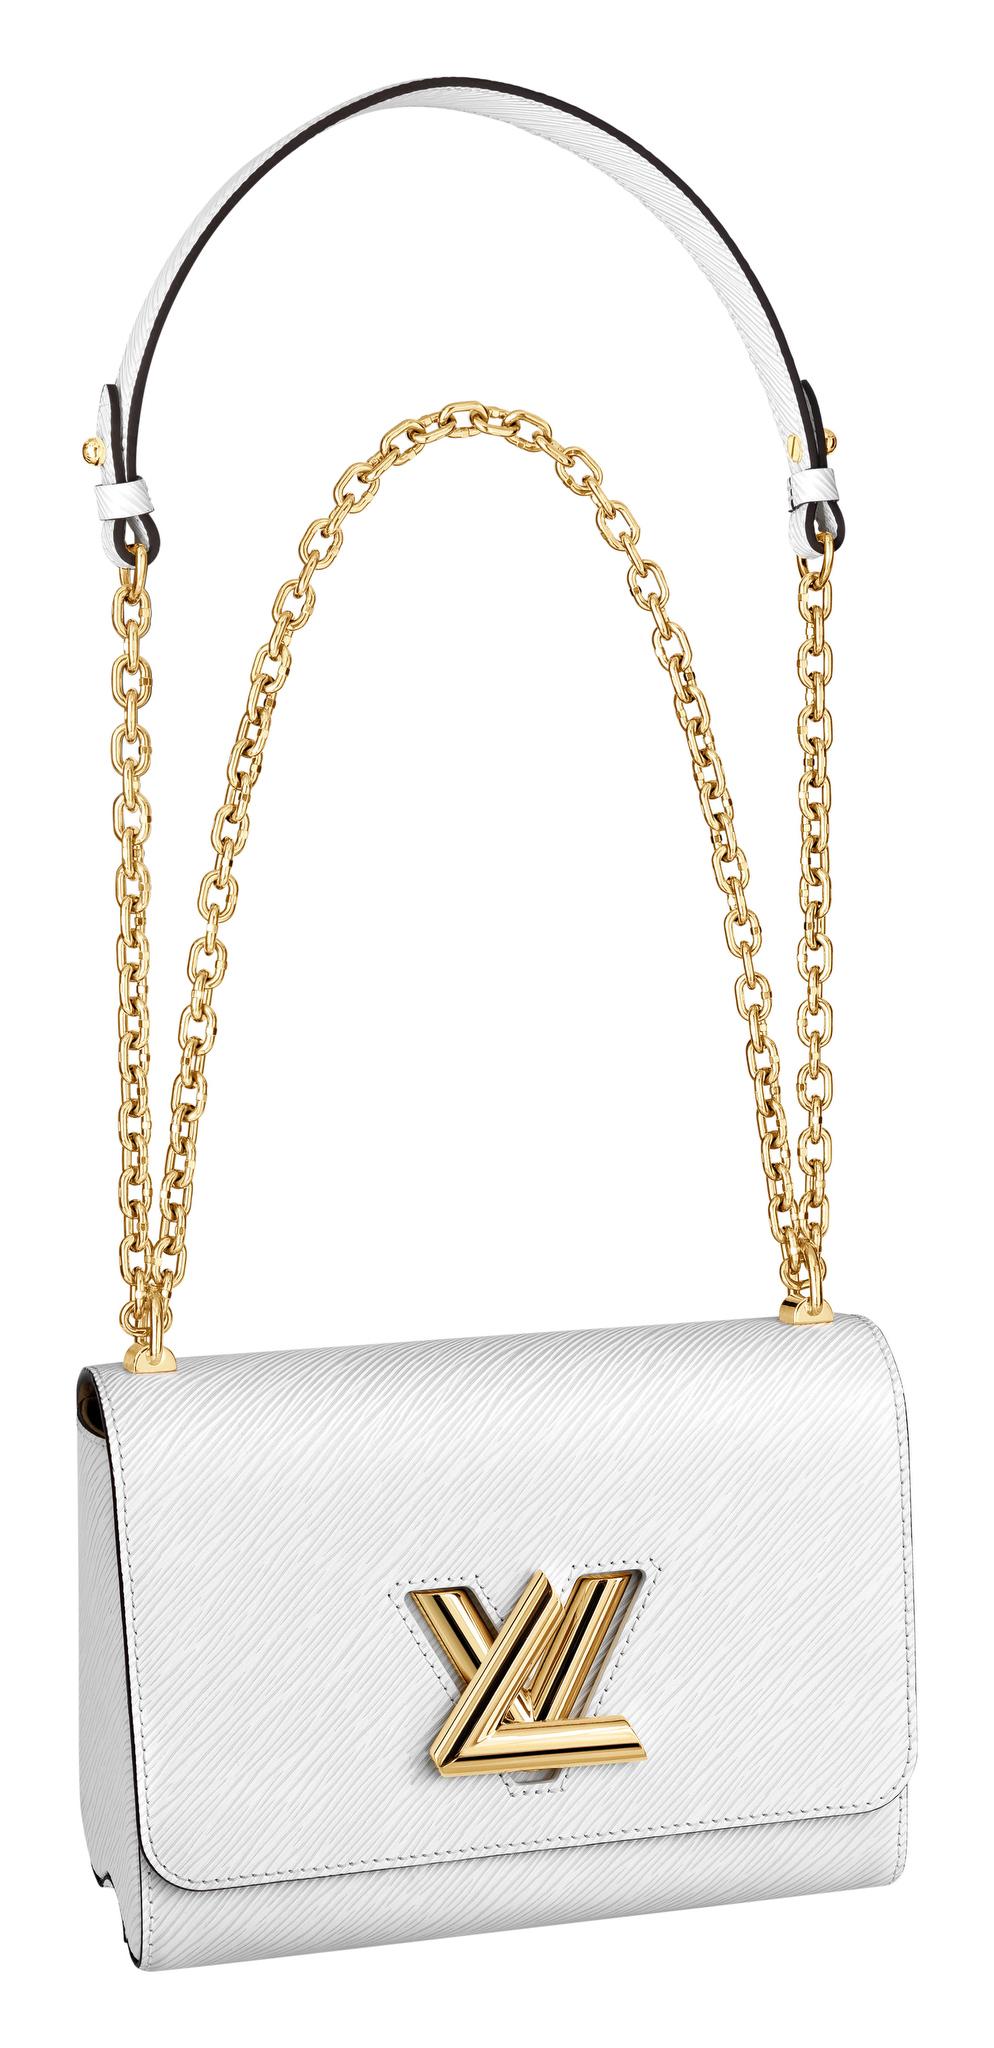 Louis VuittonÕs Twist bag, designed by Nicolas Ghesquire